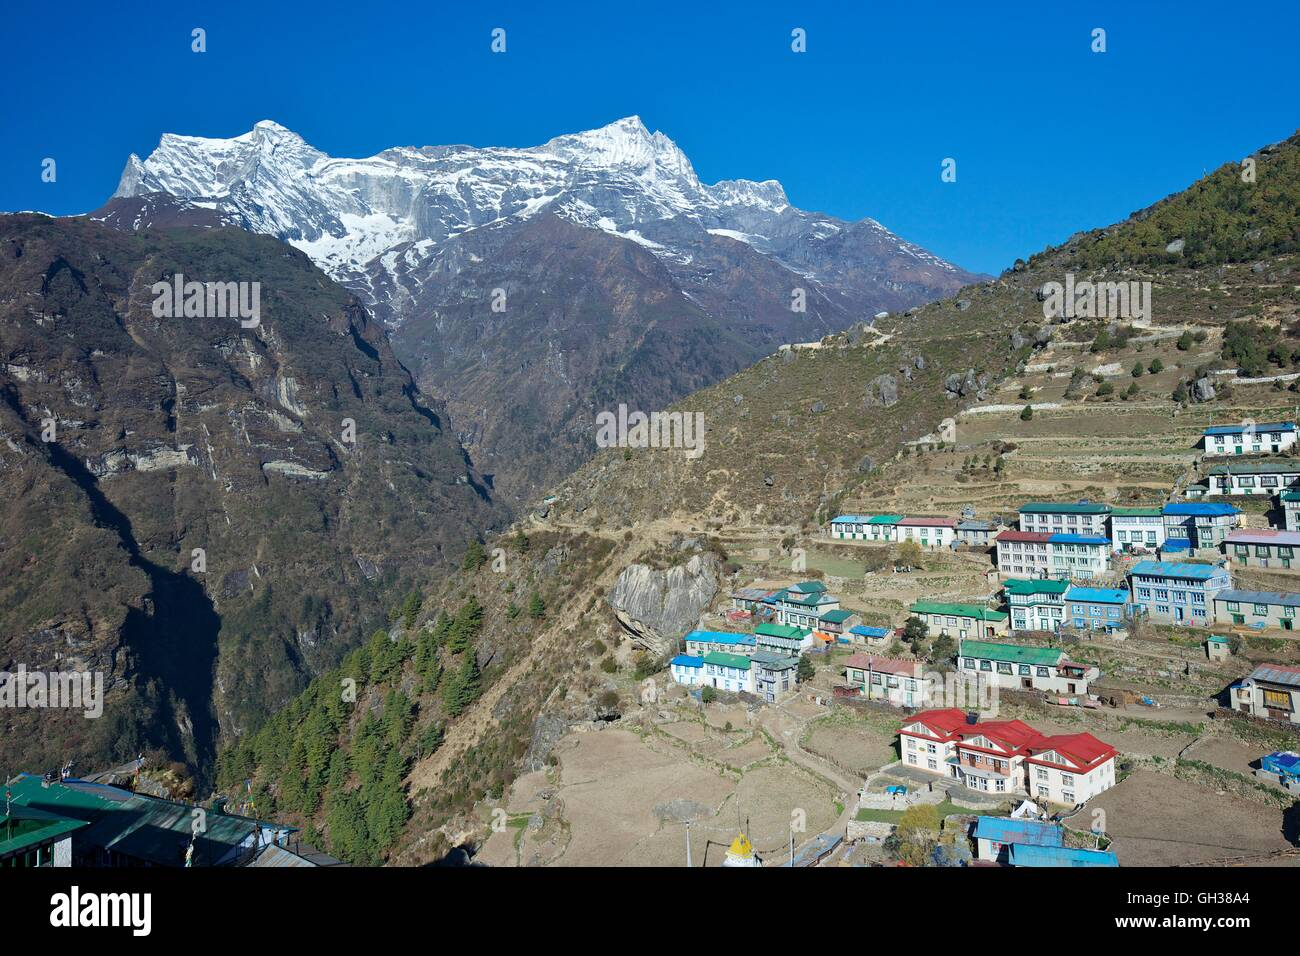 View of Kongde Ri, from Namche Bazaar, Nepal, Asia - Stock Image